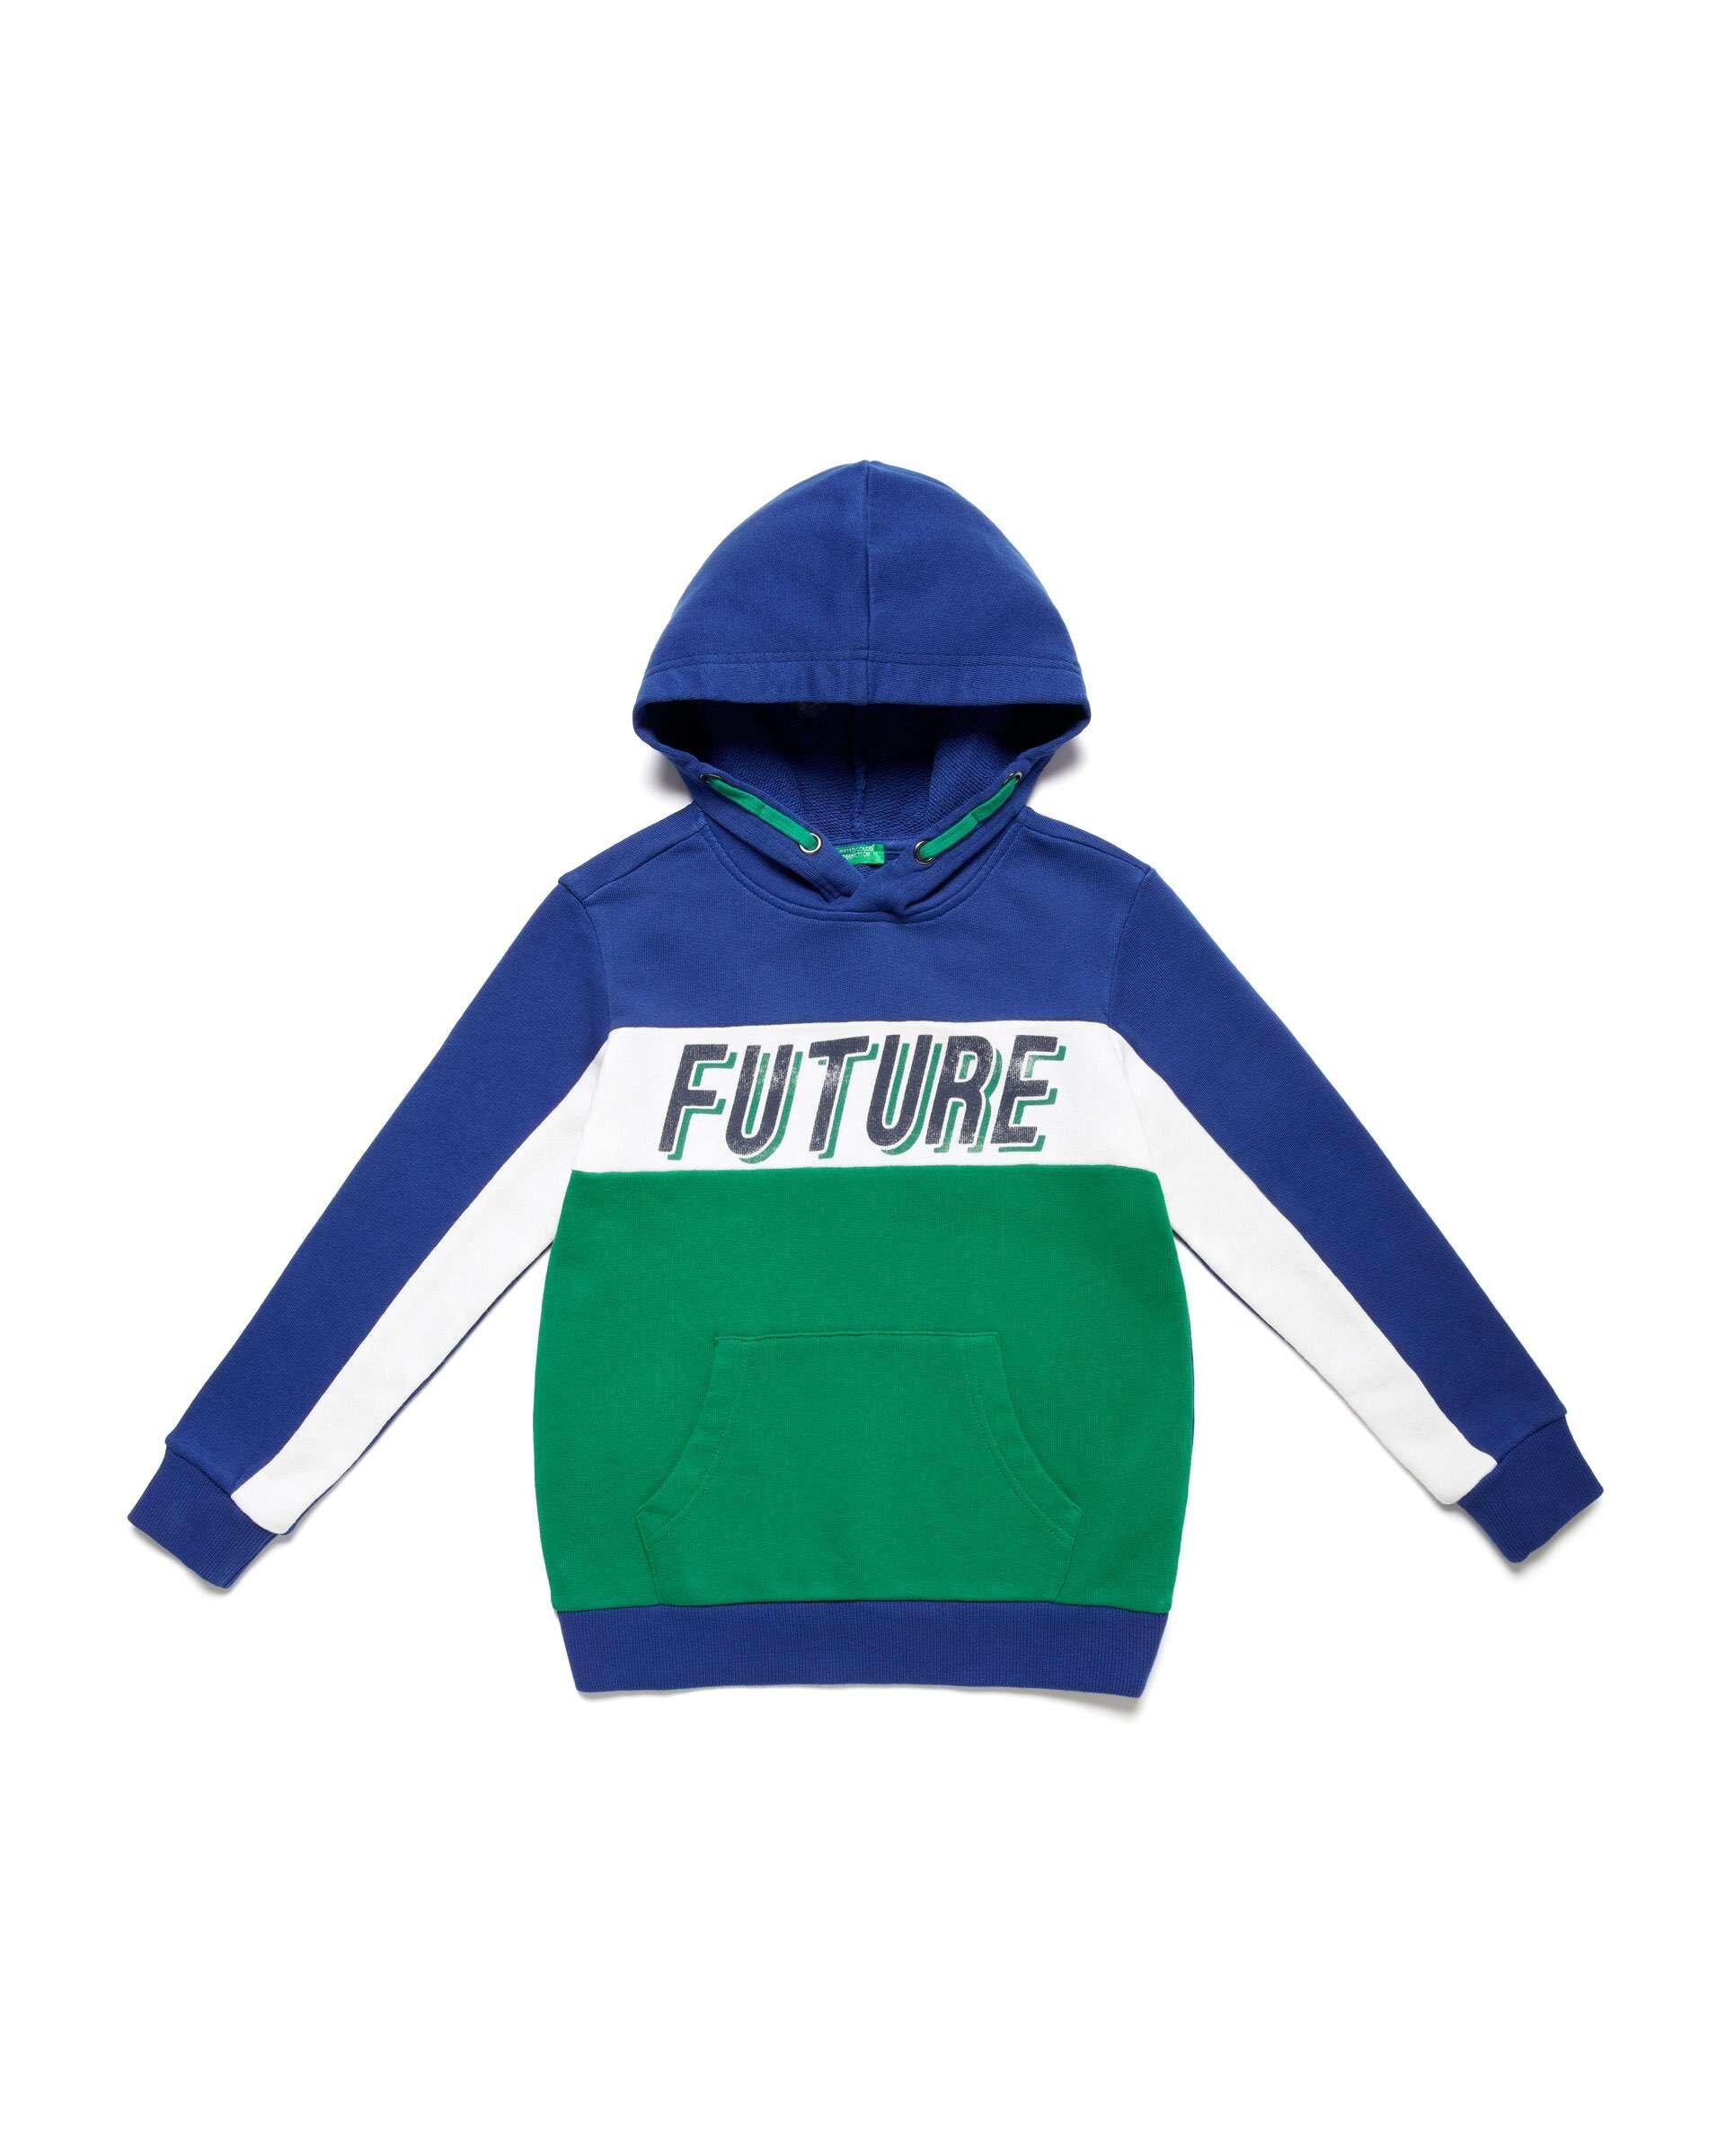 Future Yazılı Sweatshirt